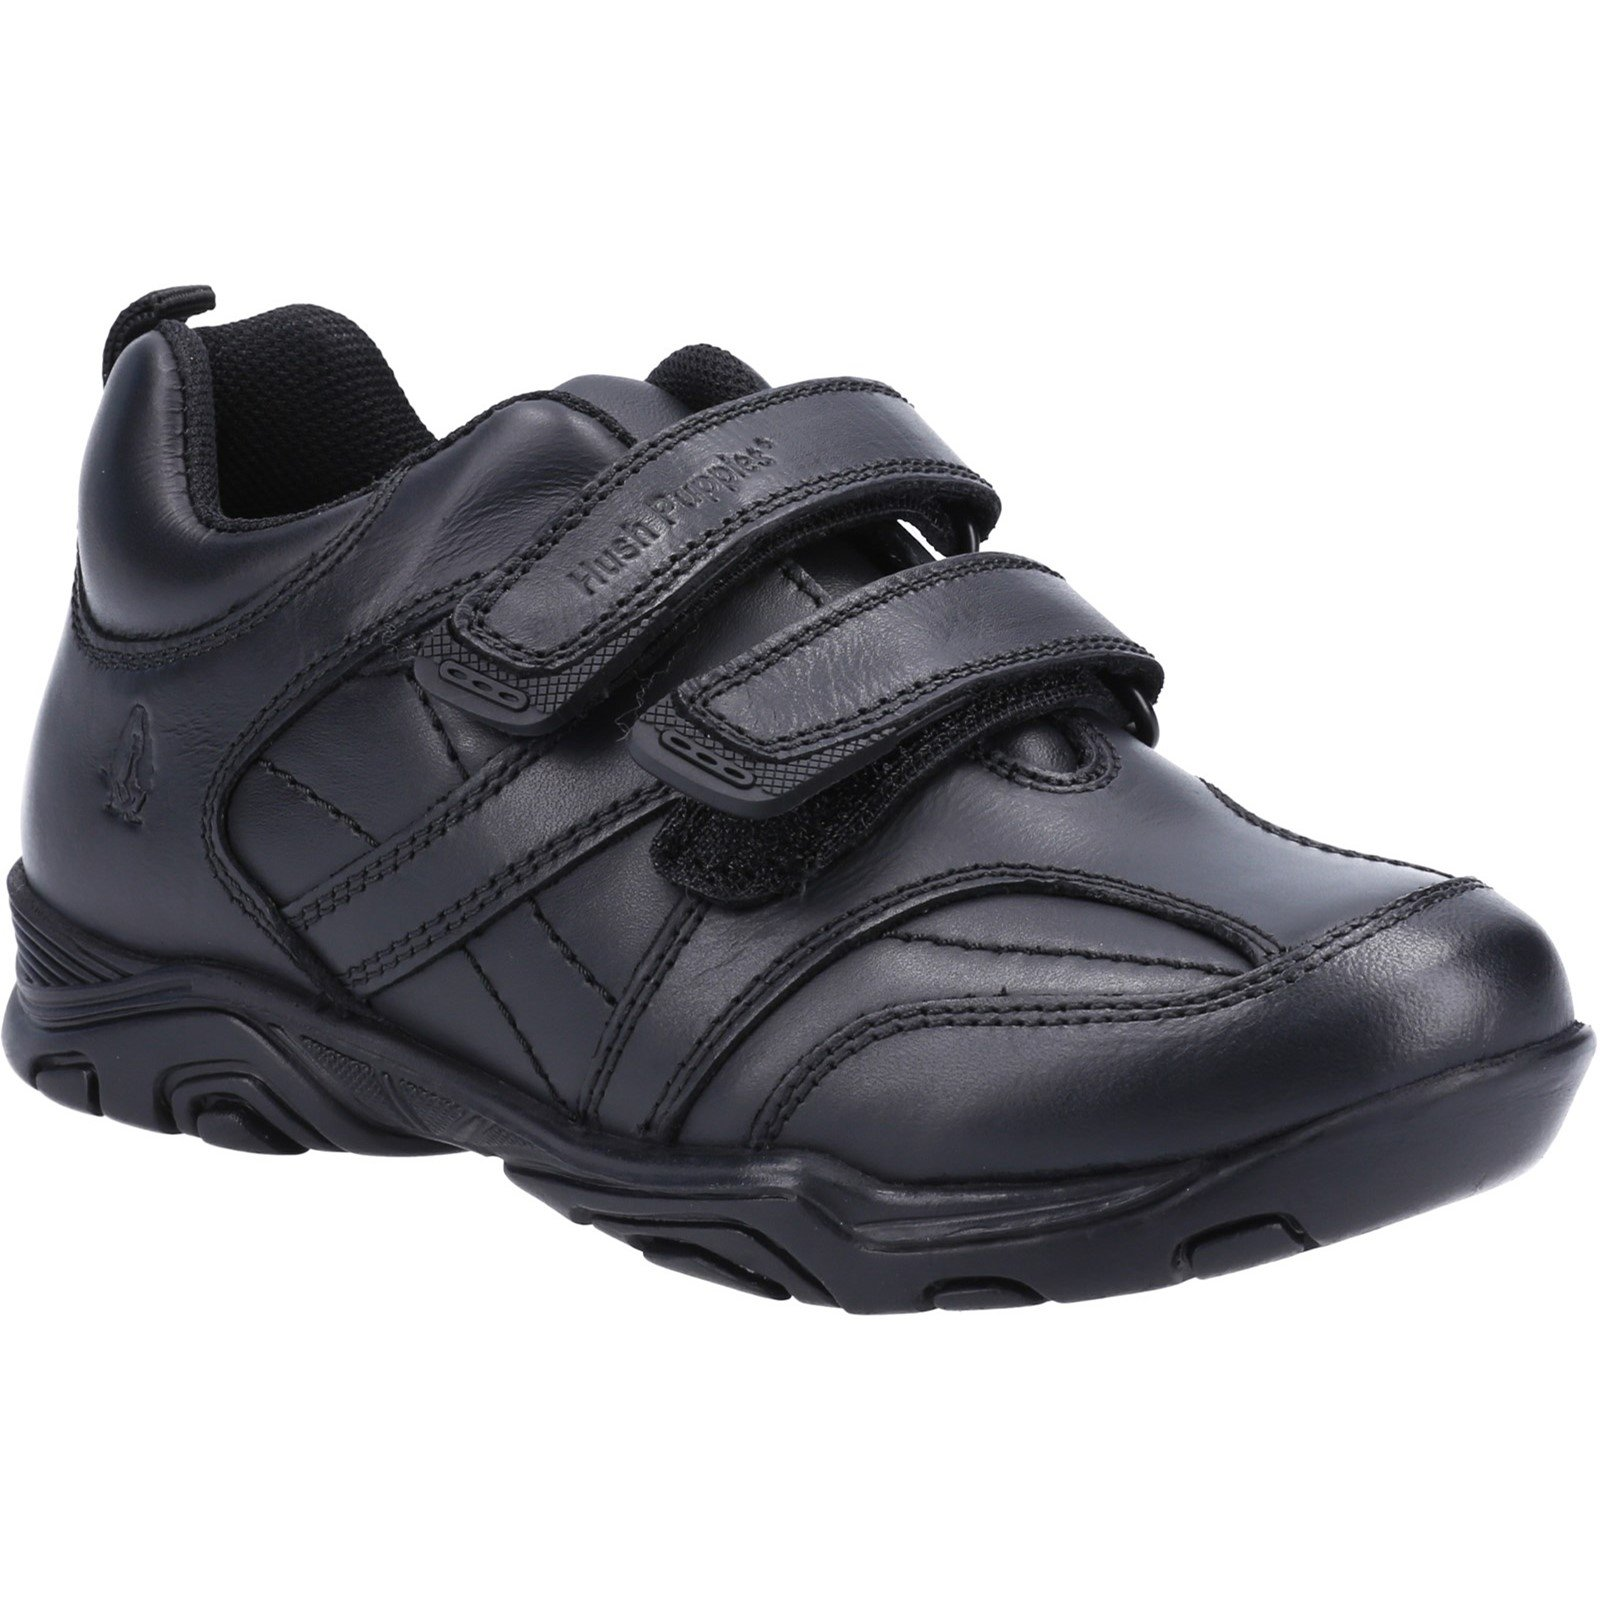 Hush Puppies Kid's Levi Infant School Shoe Black 32629 - Black 9